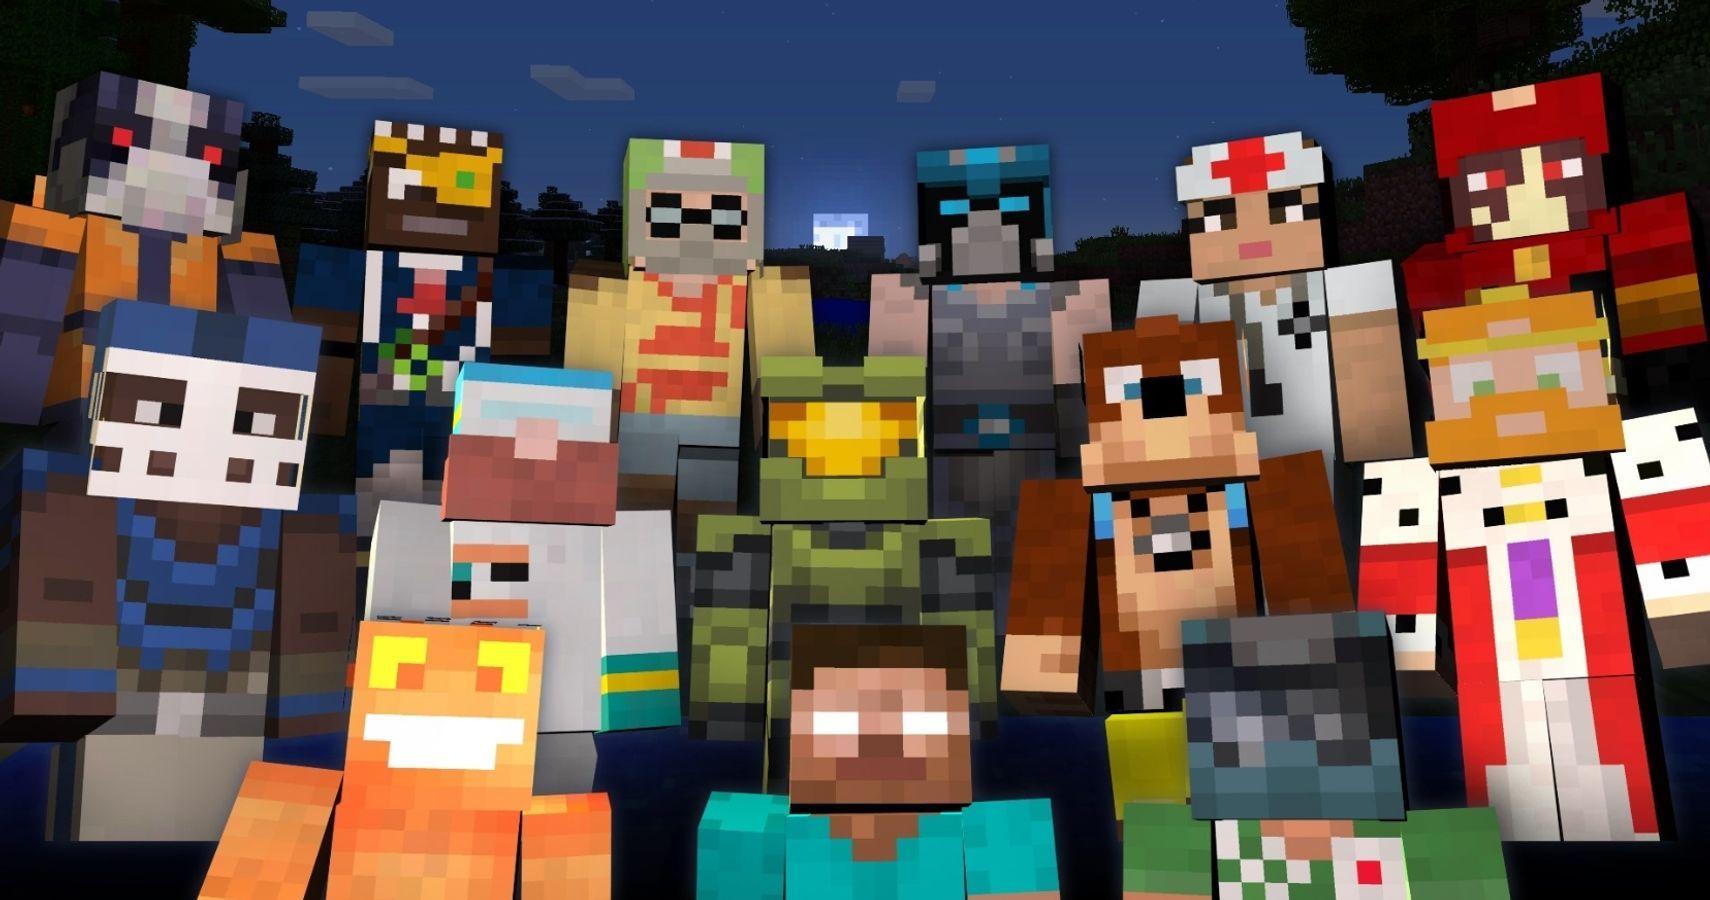 The 12 Best Skin Packs For Minecraft Bedrock Edition  TheGamer